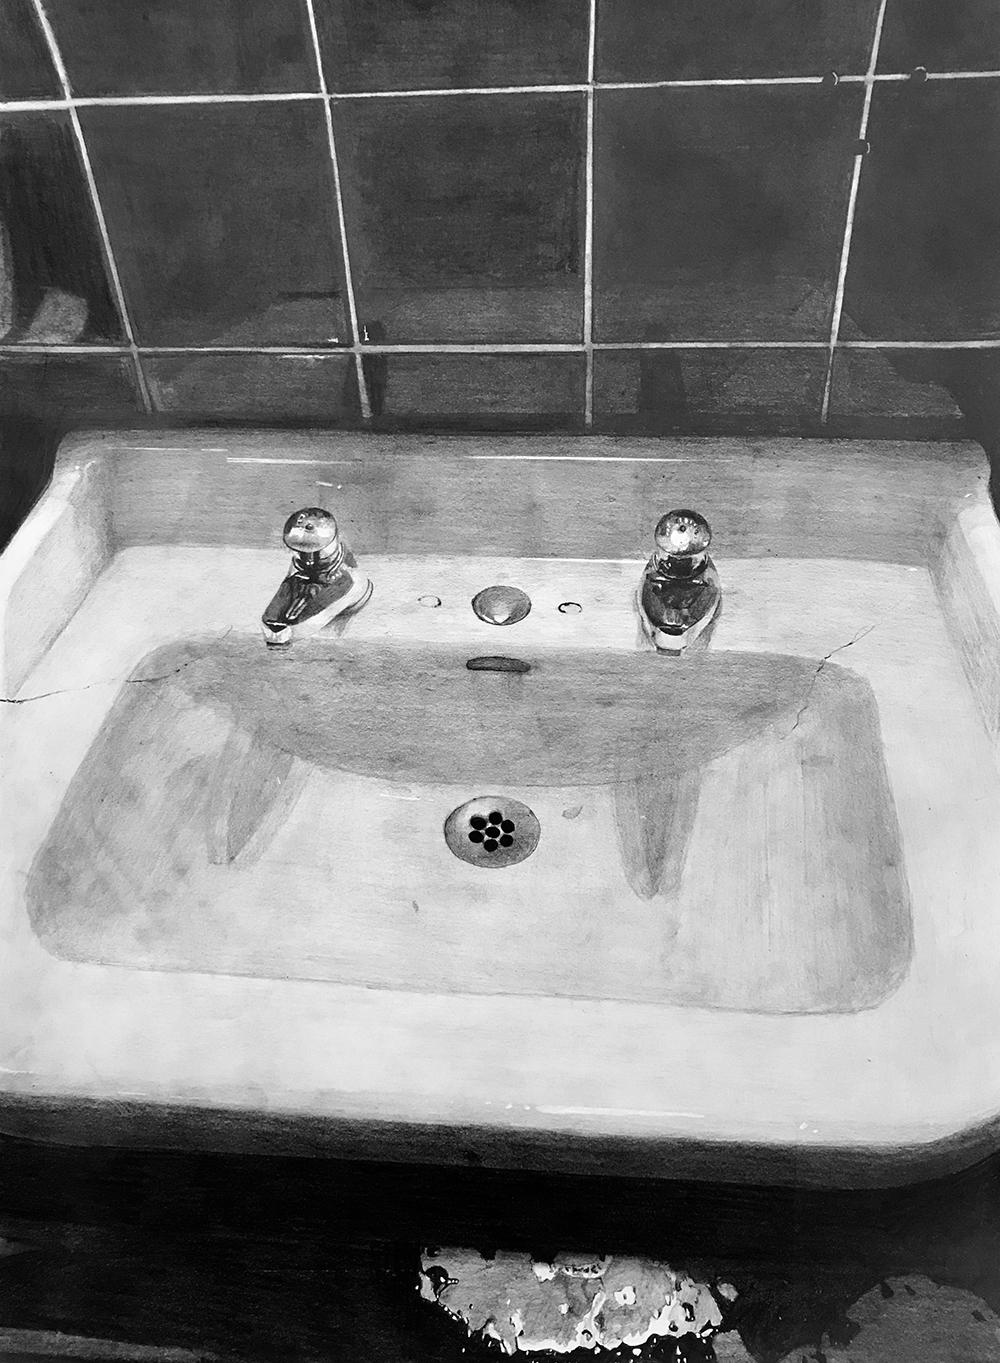 Solitude Contemporaine - Série de dessin au crayon graphite, 2018-2019